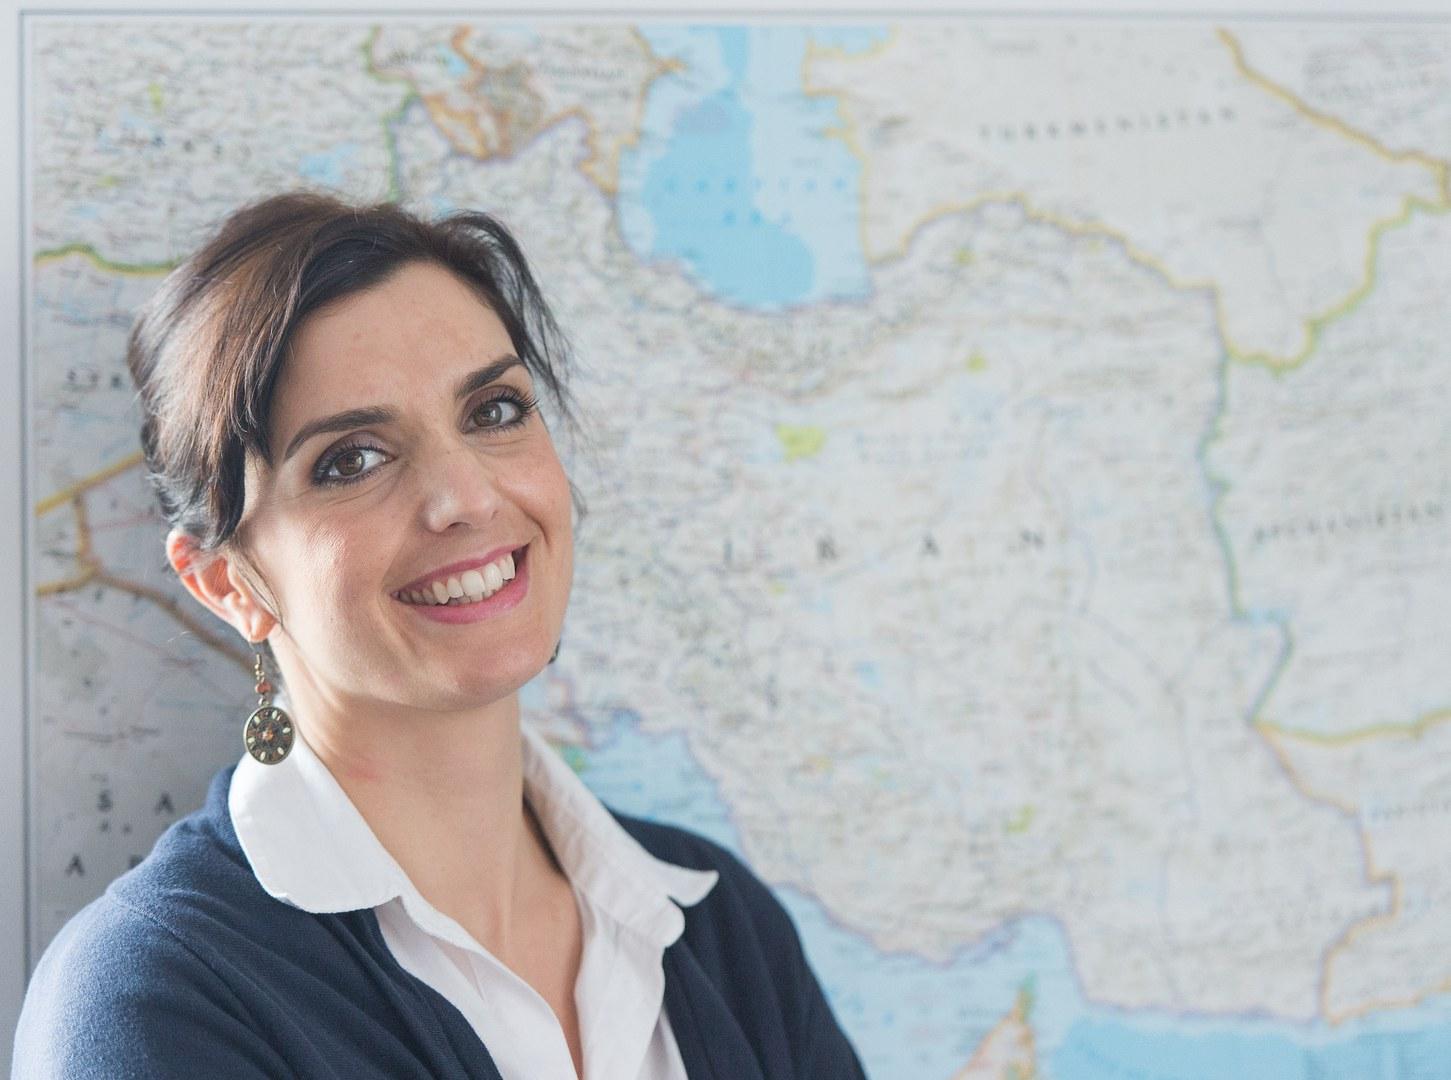 Dr. Jasmin Khosravie